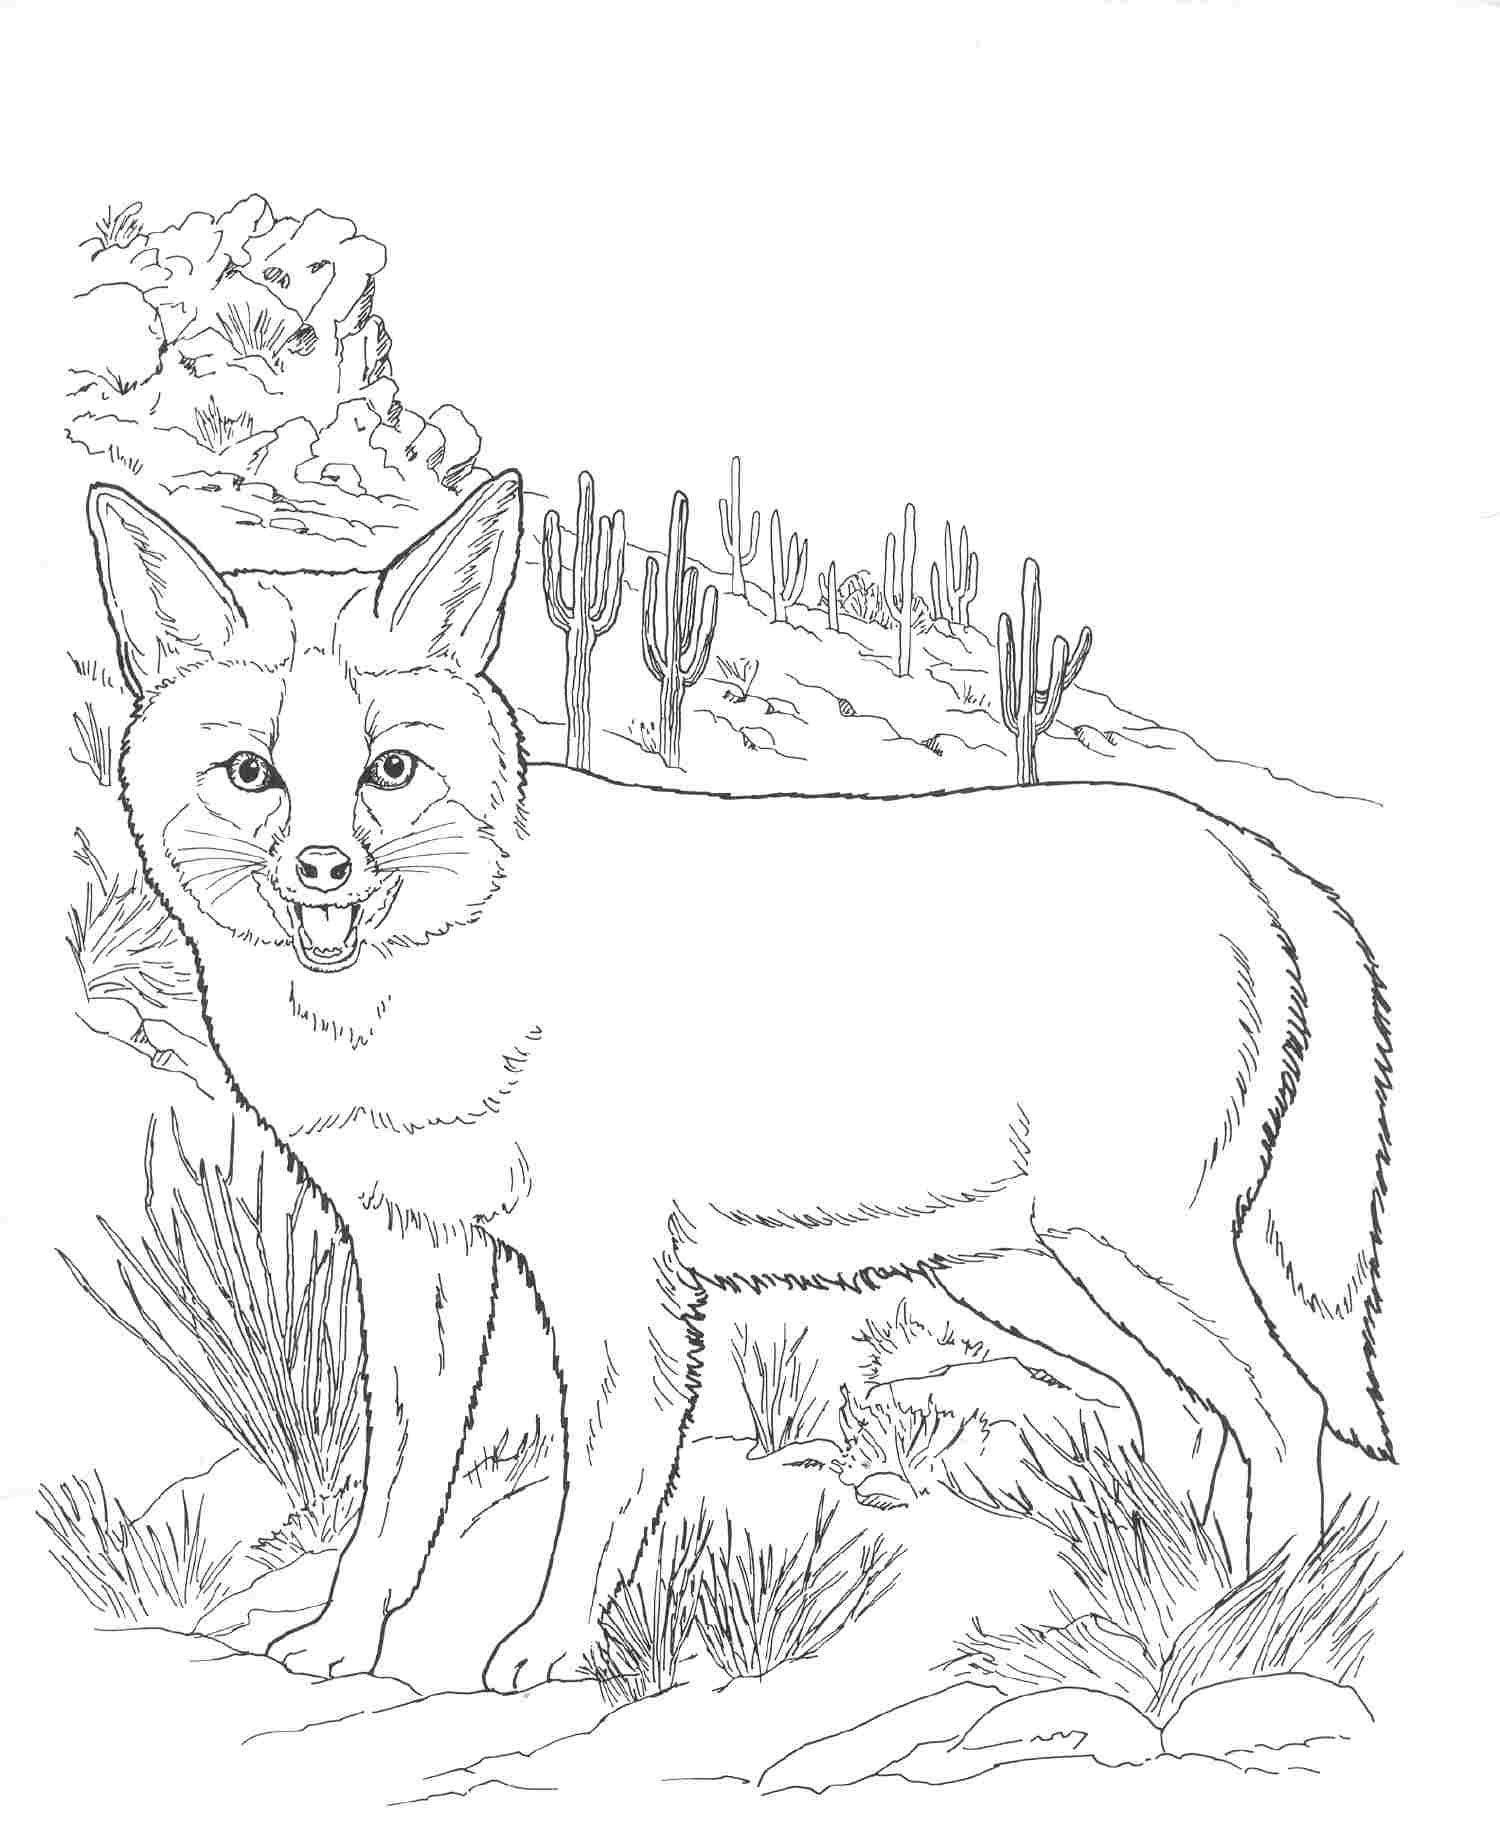 30 Coloring Pages Desert Coloring Pages Coloring Pages Animal